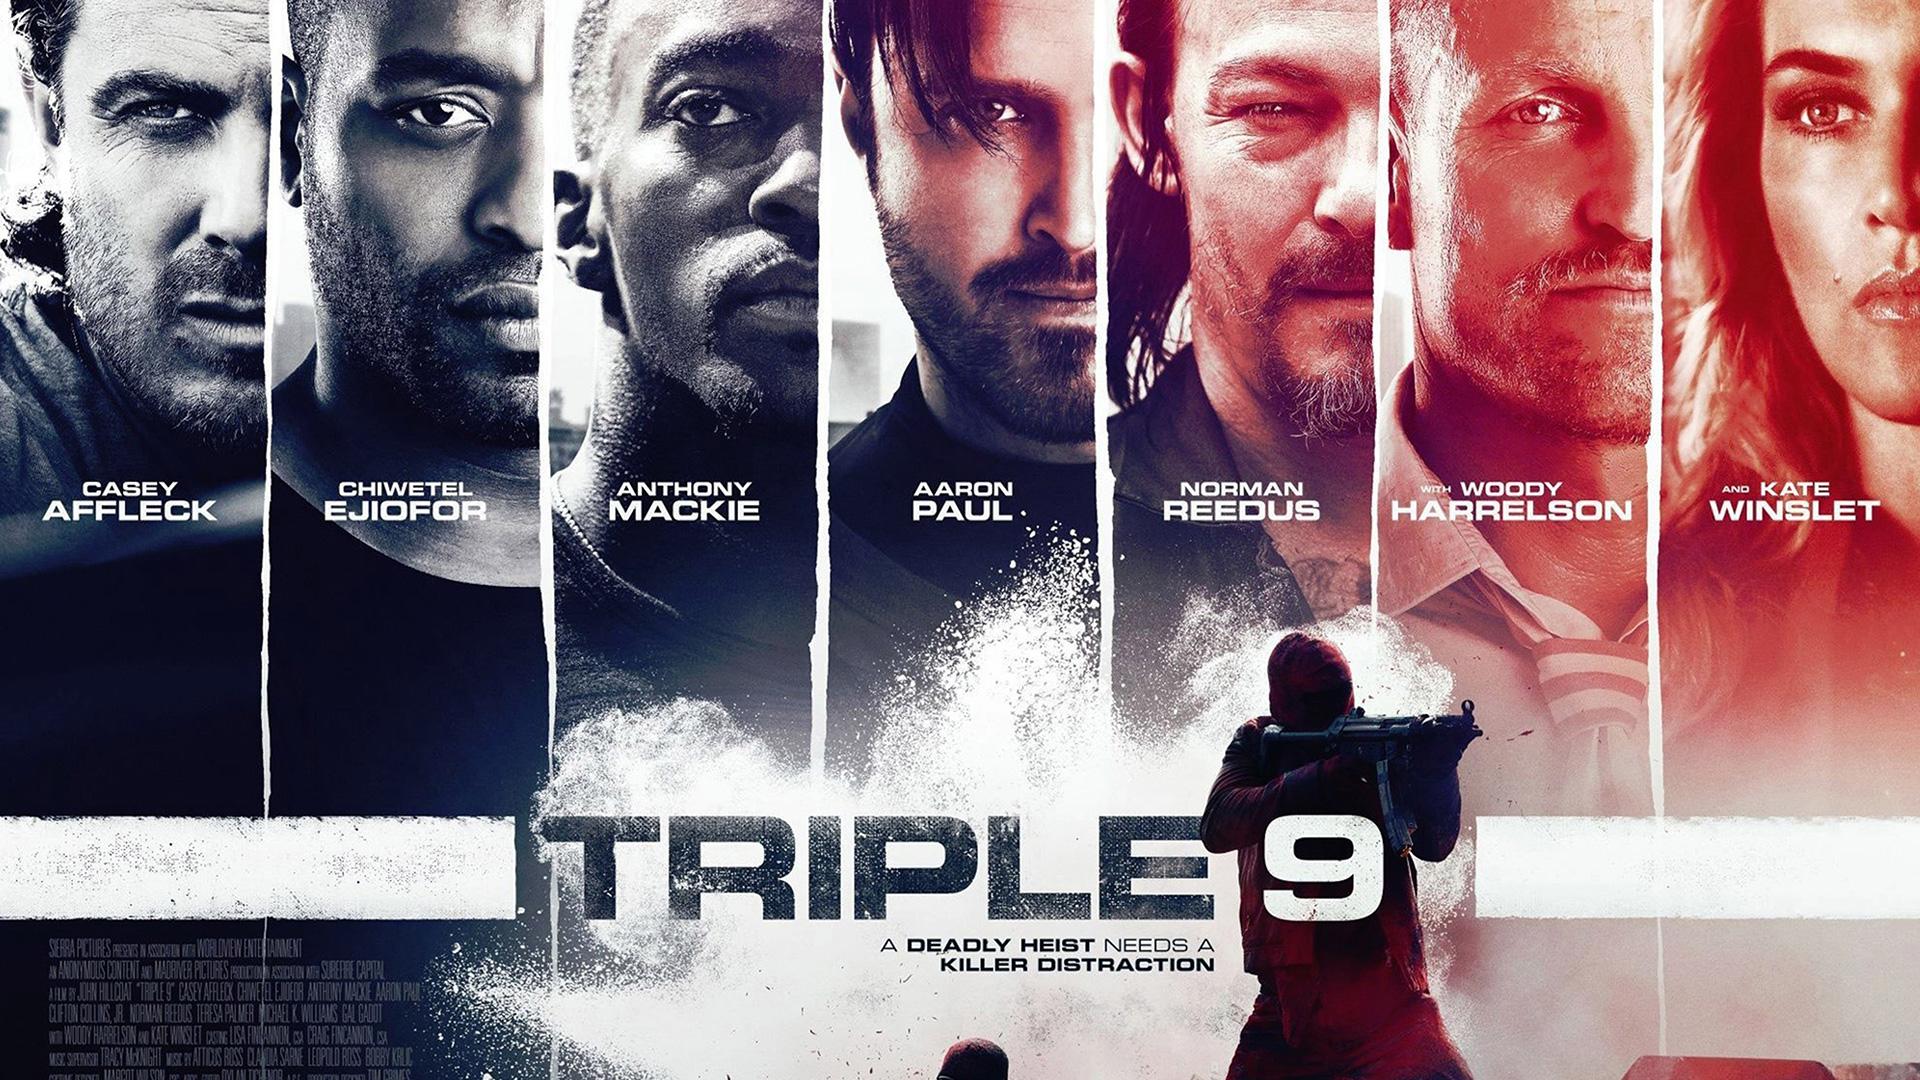 Triple 9 Wallpaper HD 2016 film Poster Exclusive! Free HD